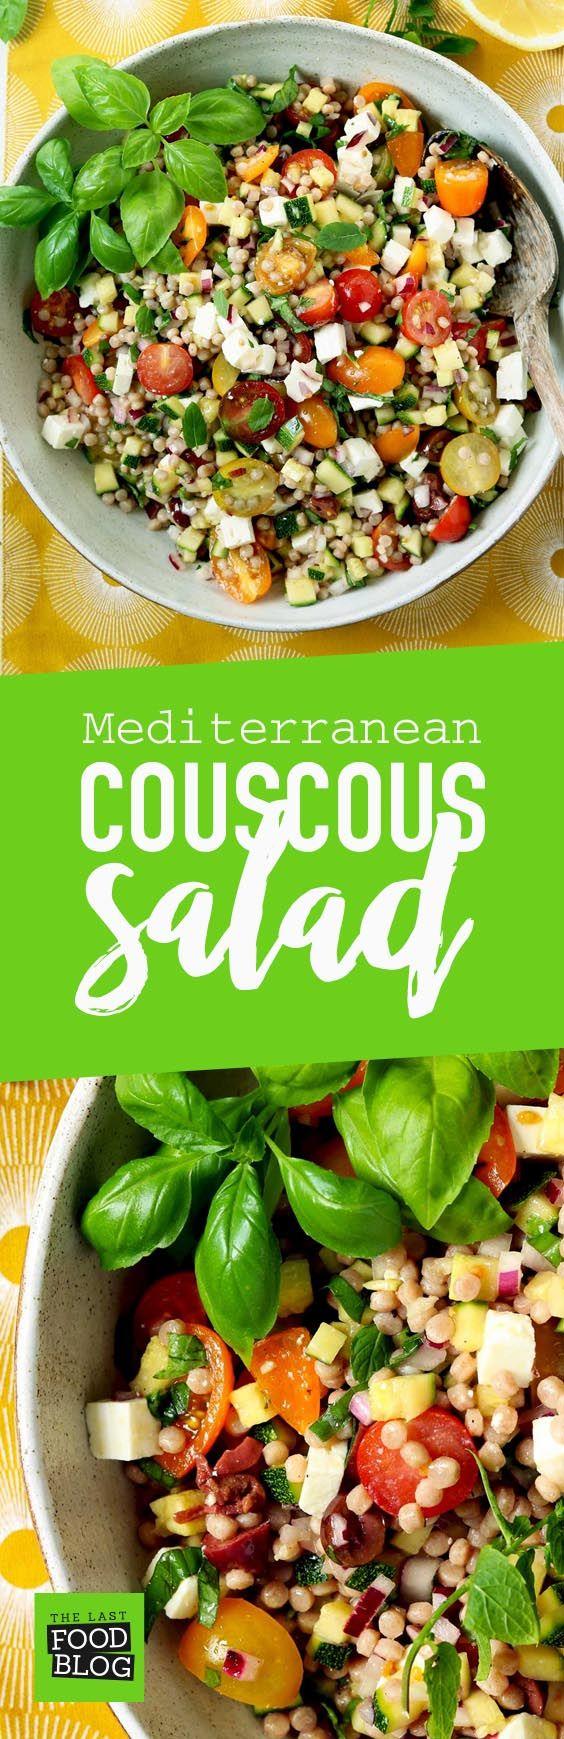 Mediterranean Couscous Salad - thelastfoodblog